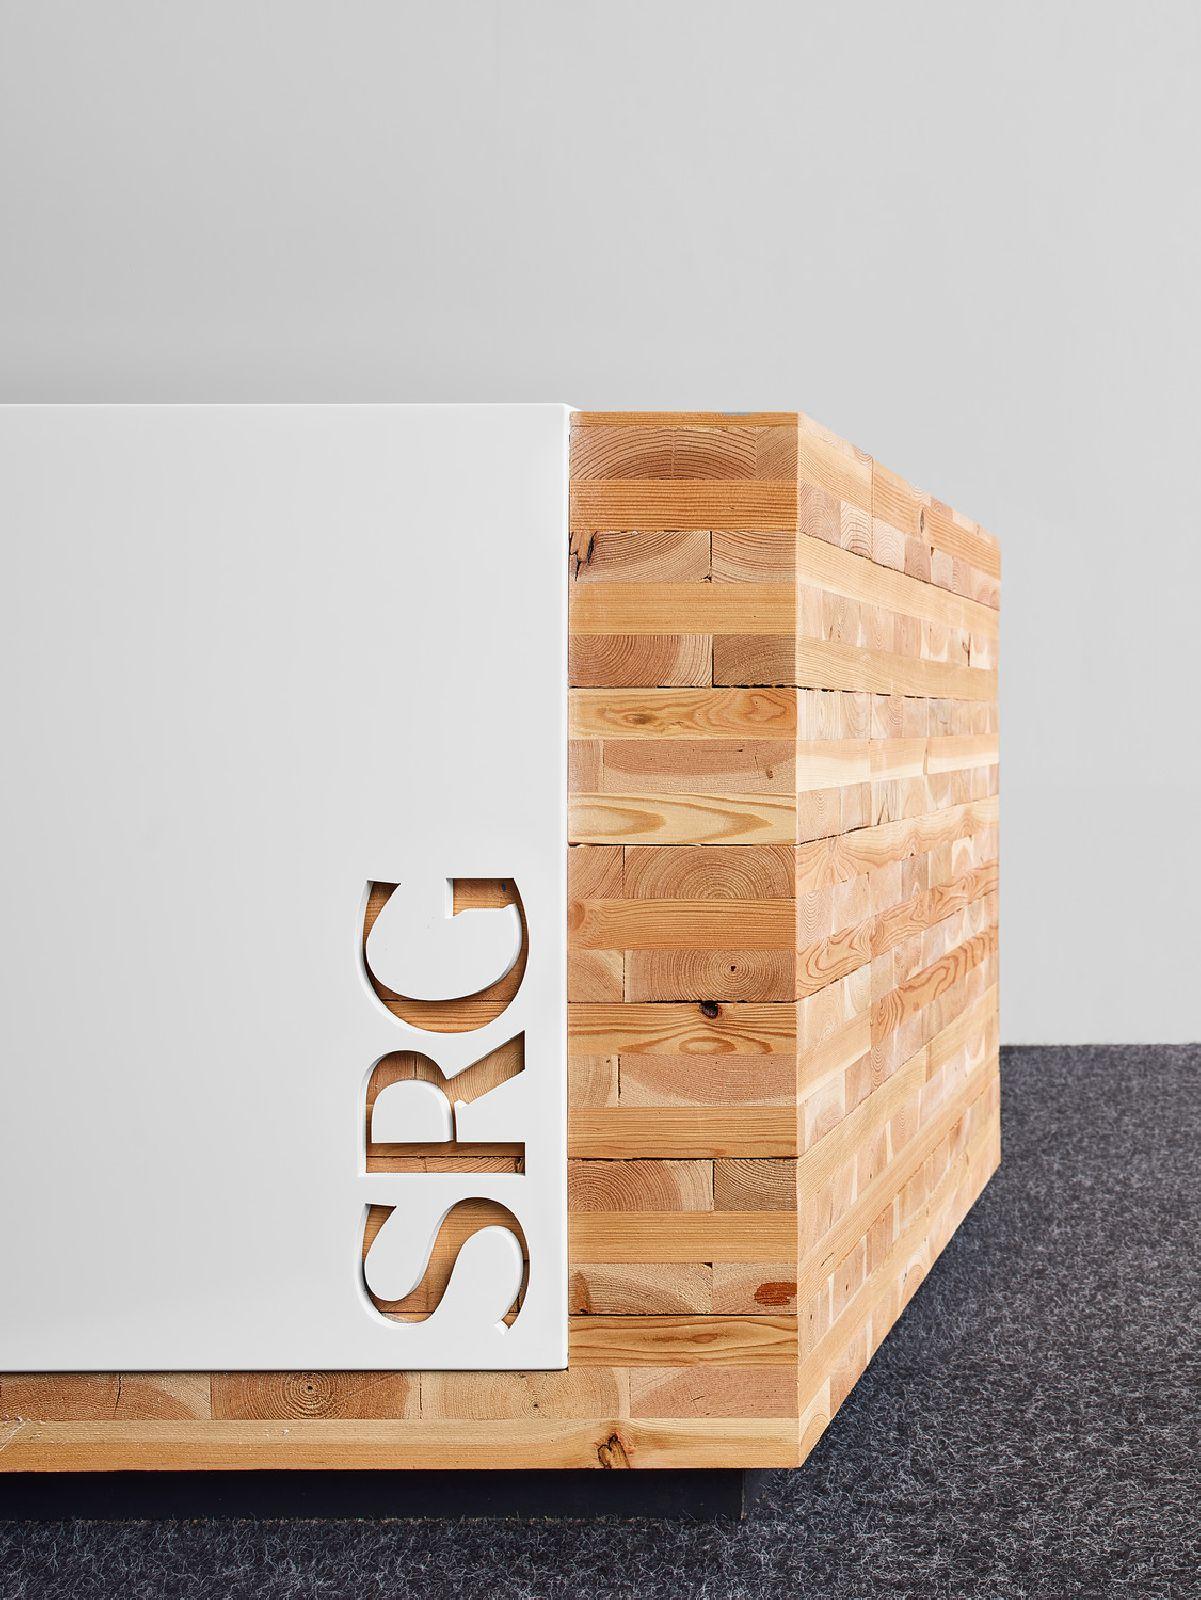 SRG New Studio